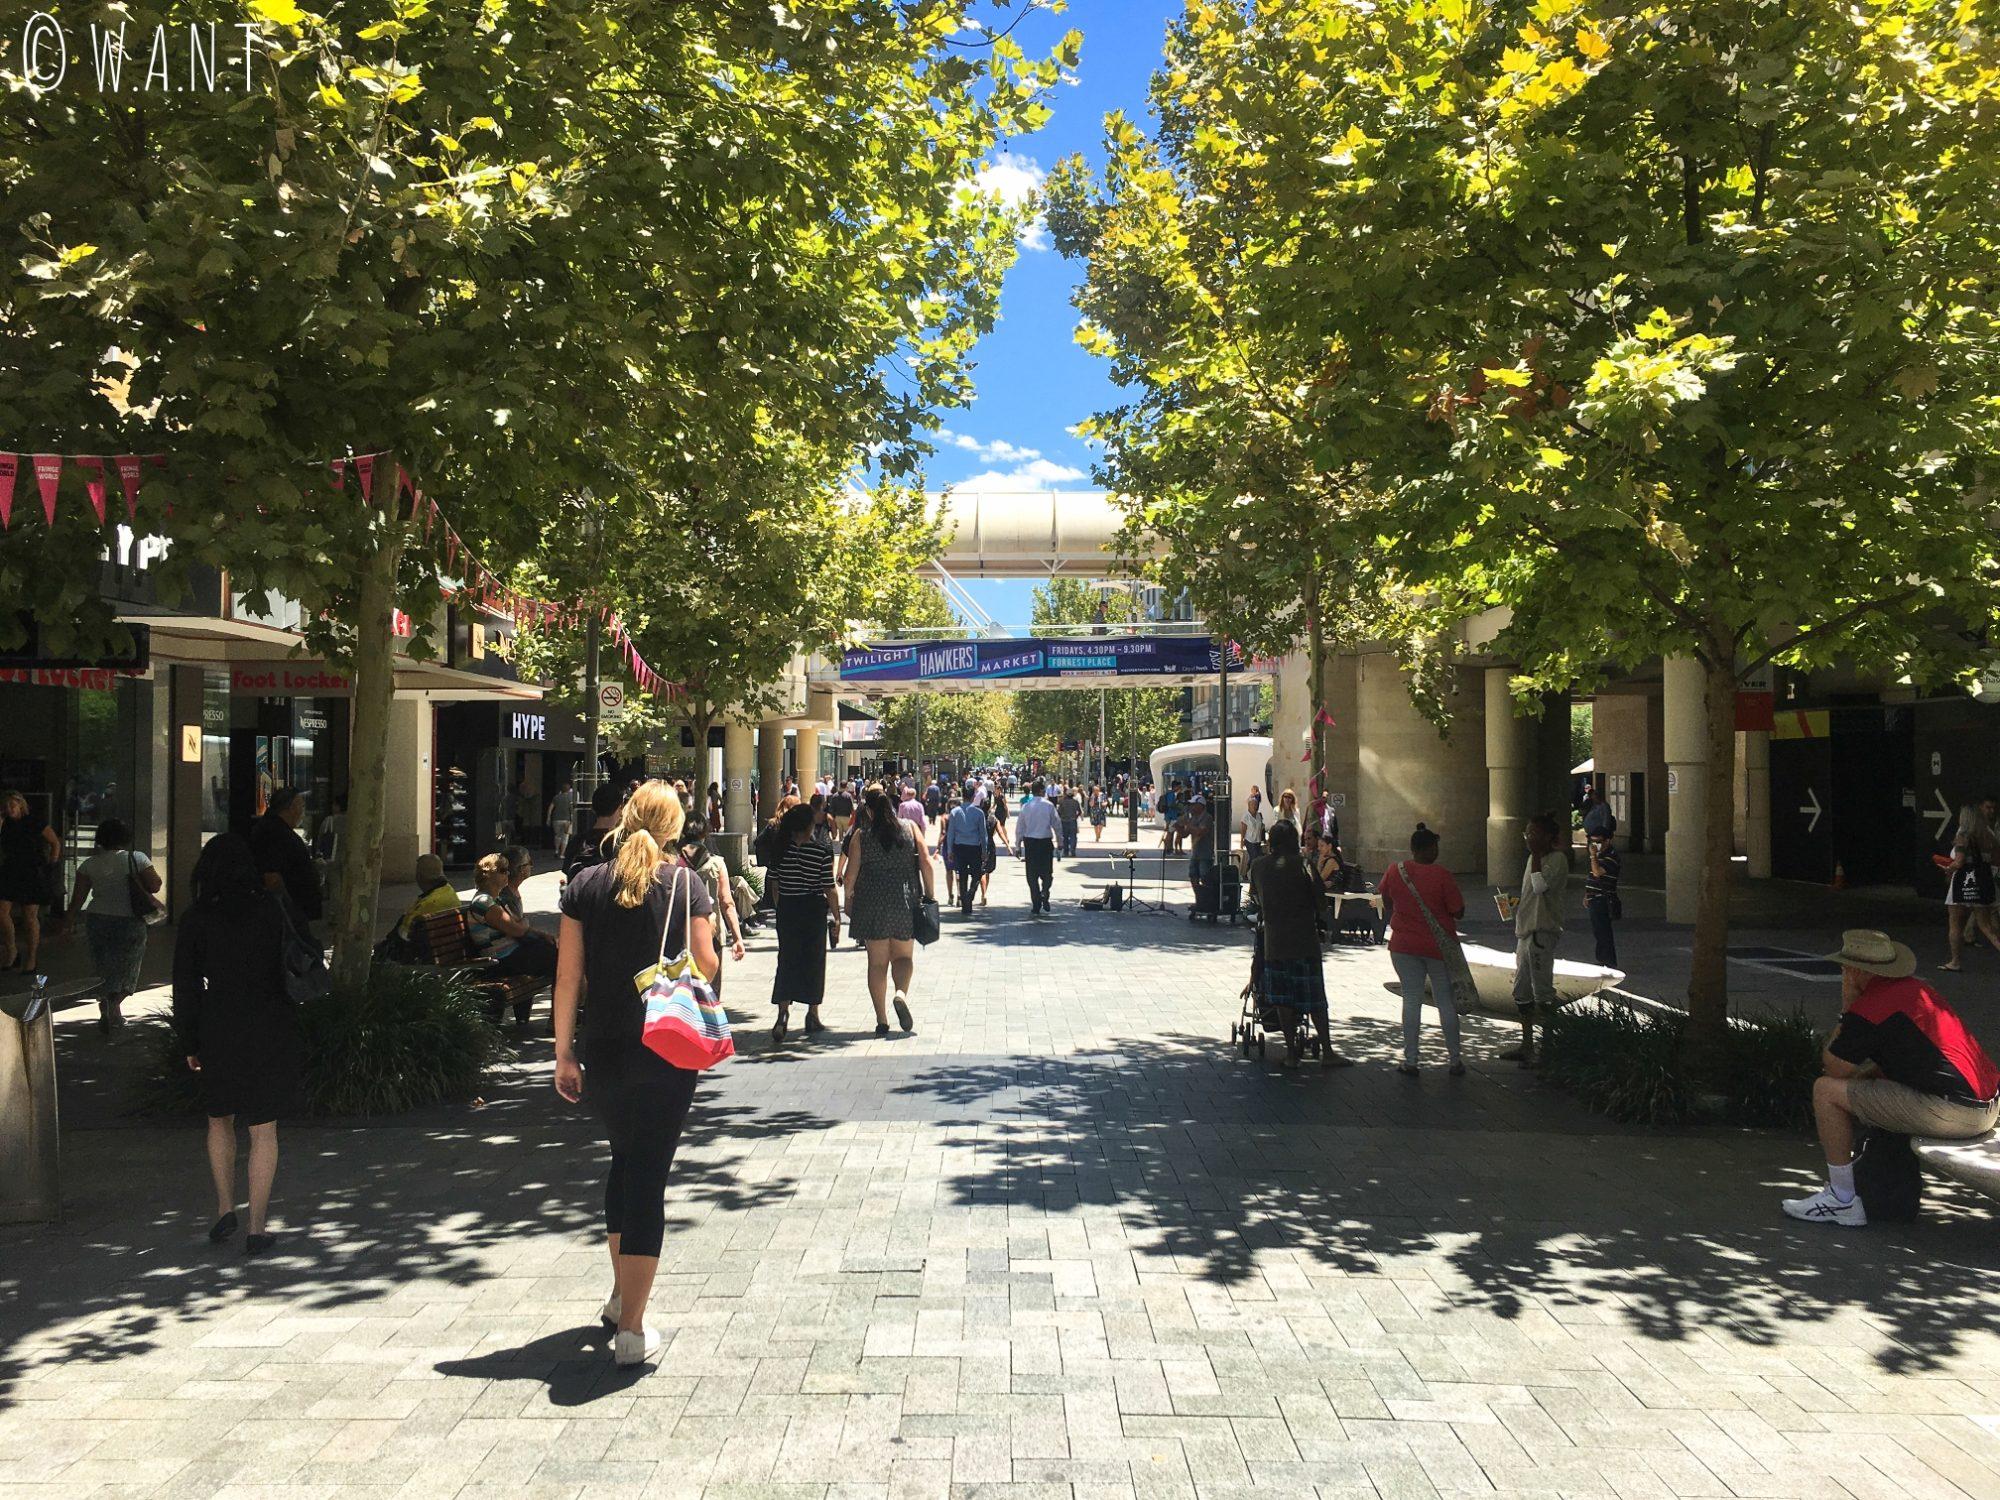 La rue commercante de Murray Street Mall à Perth, où de nombreux artistes de rue sont en représentation